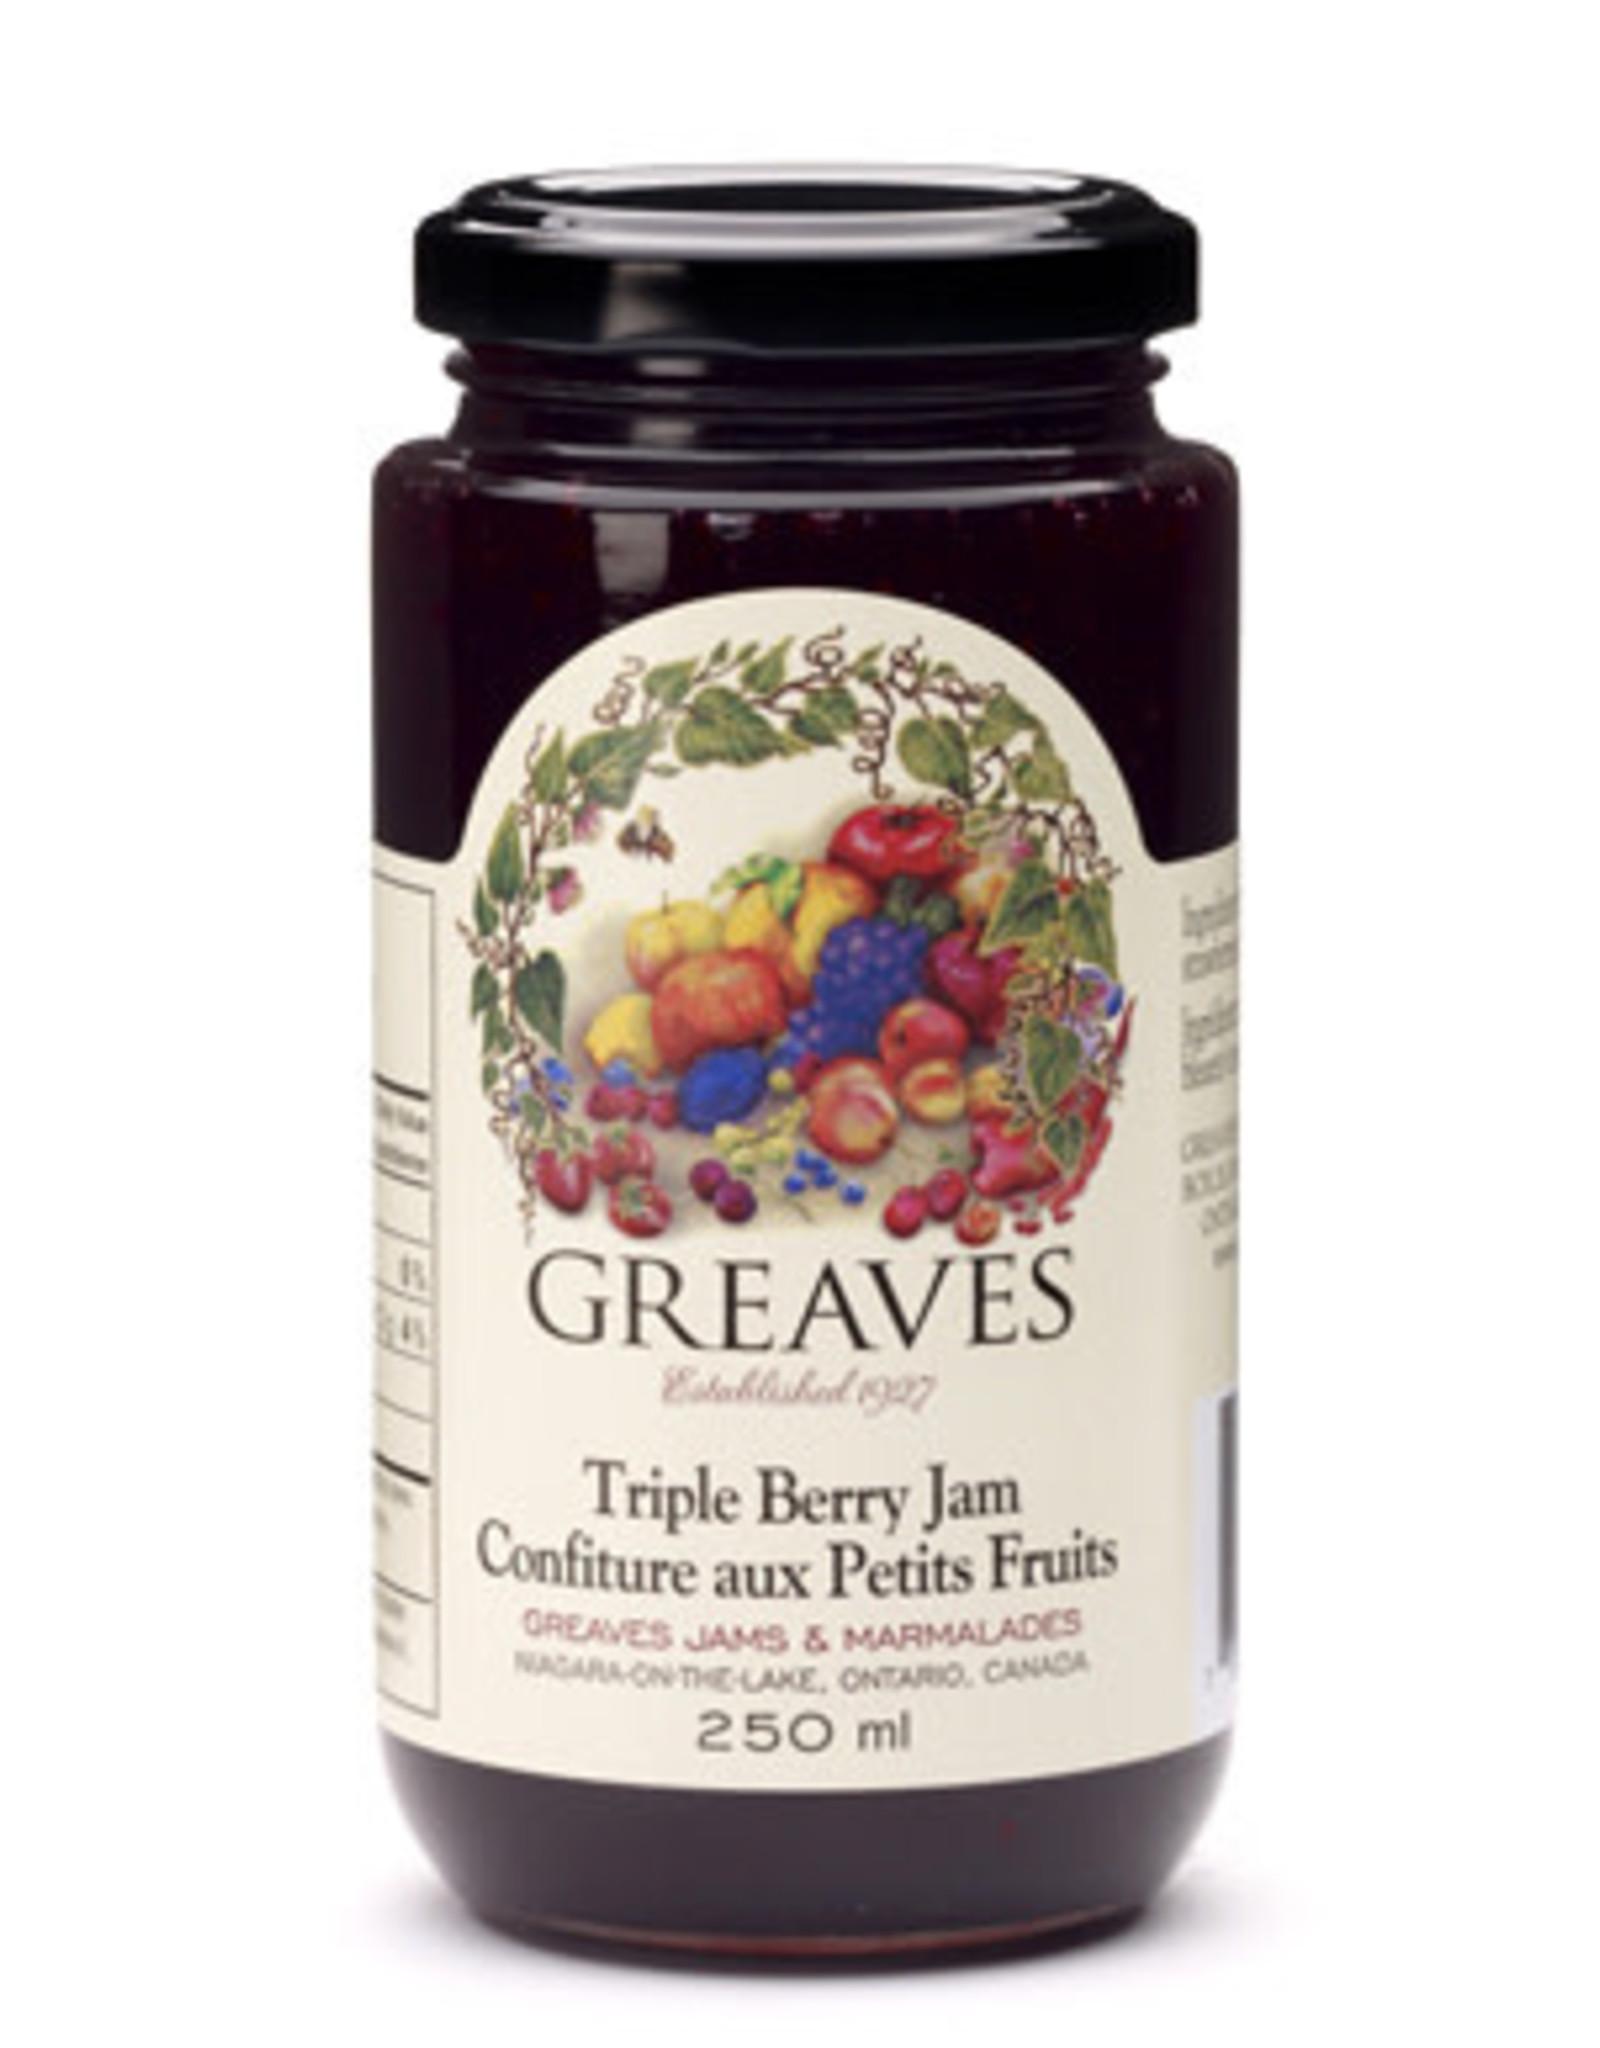 Greaves Jams & Marmalades Ltd. Greaves, Triple Berry Jam, 250ml